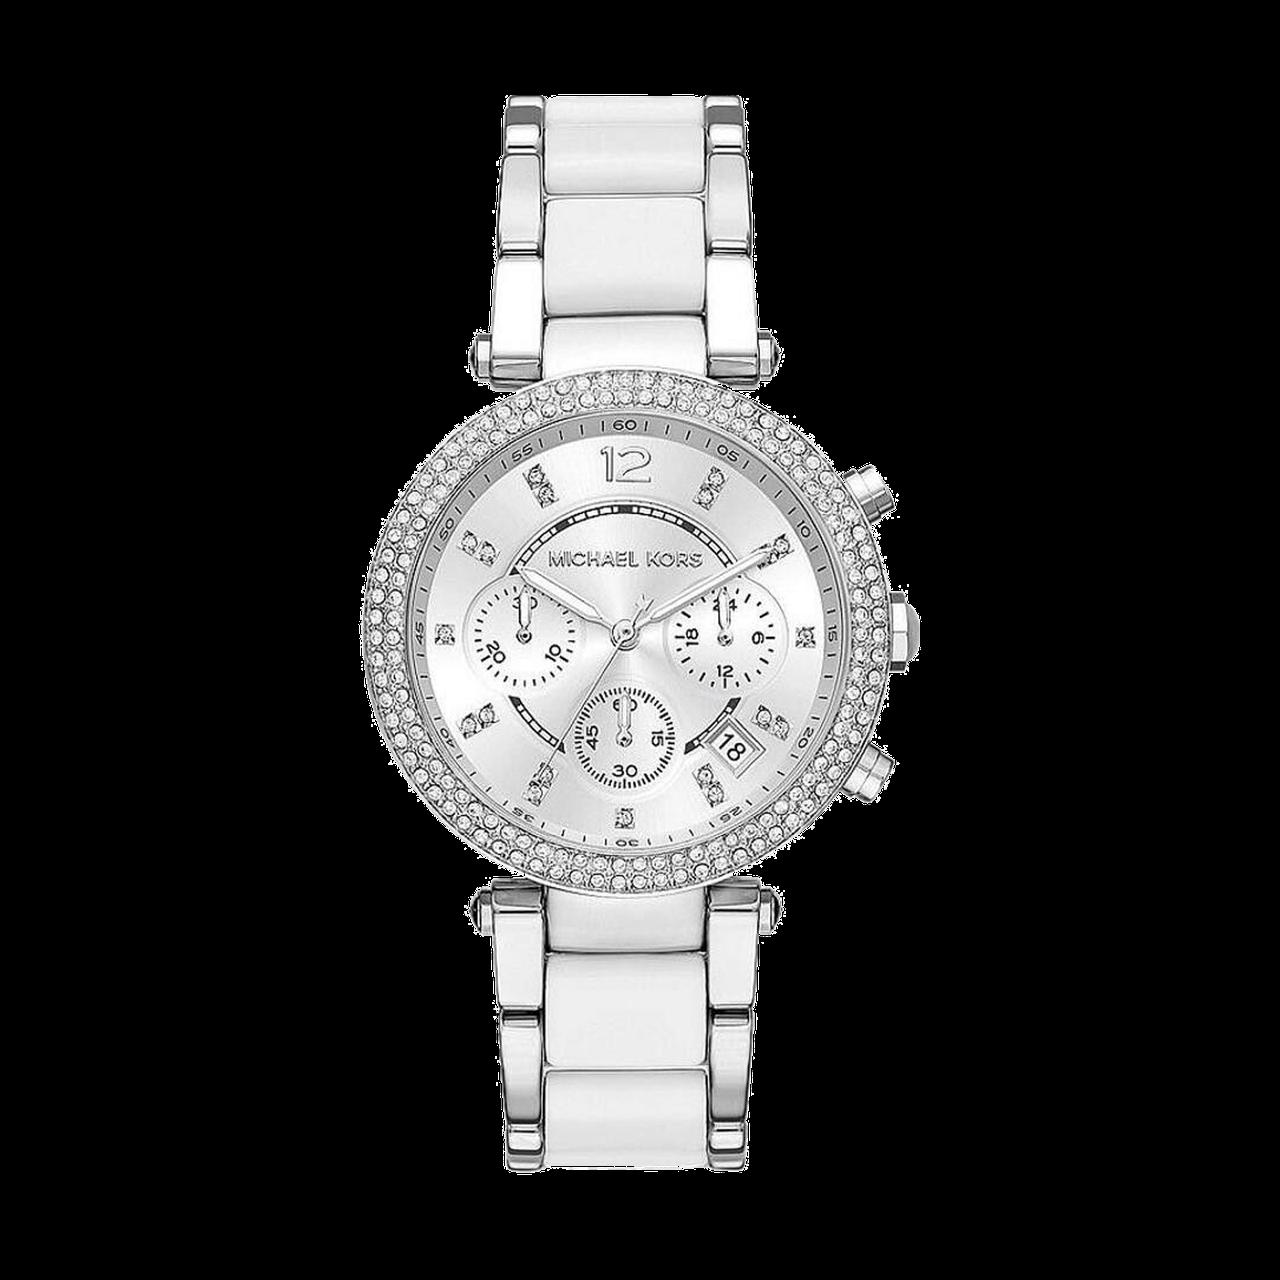 Женские часы Michael Kors MK6354